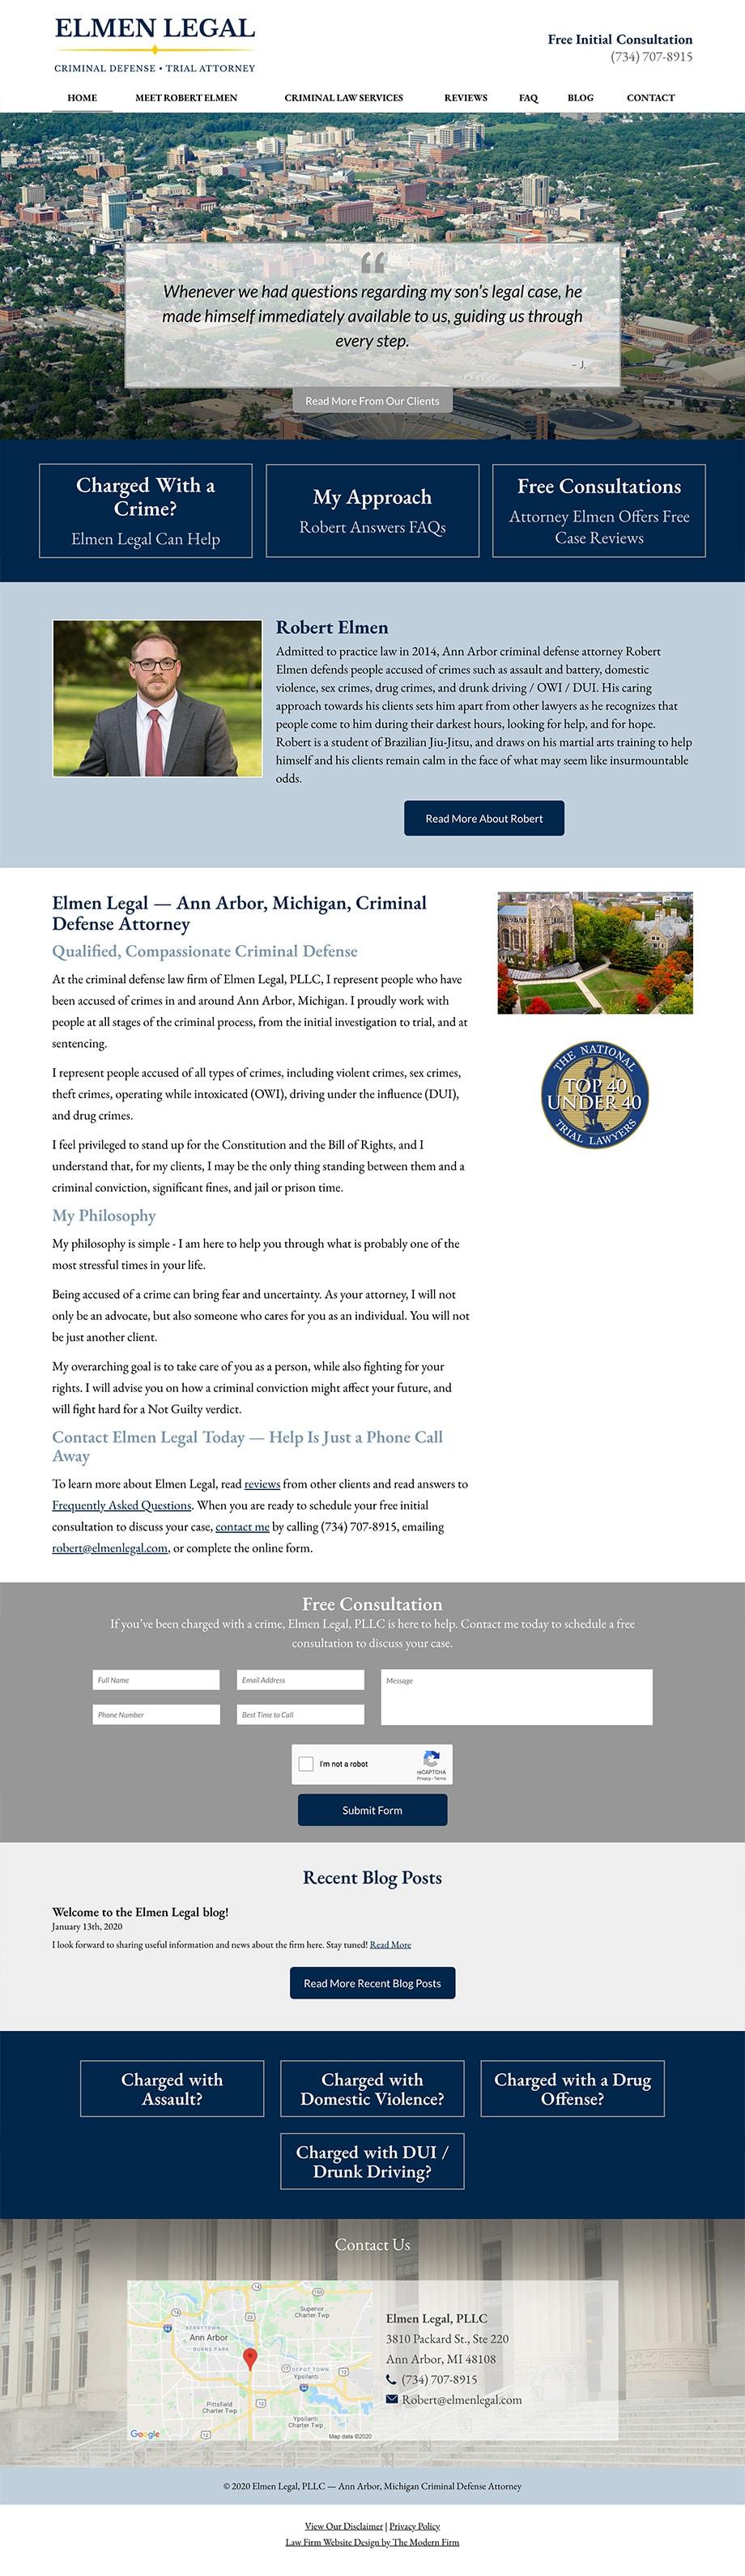 Law Firm Website Design for Elmen Legal, PLLC